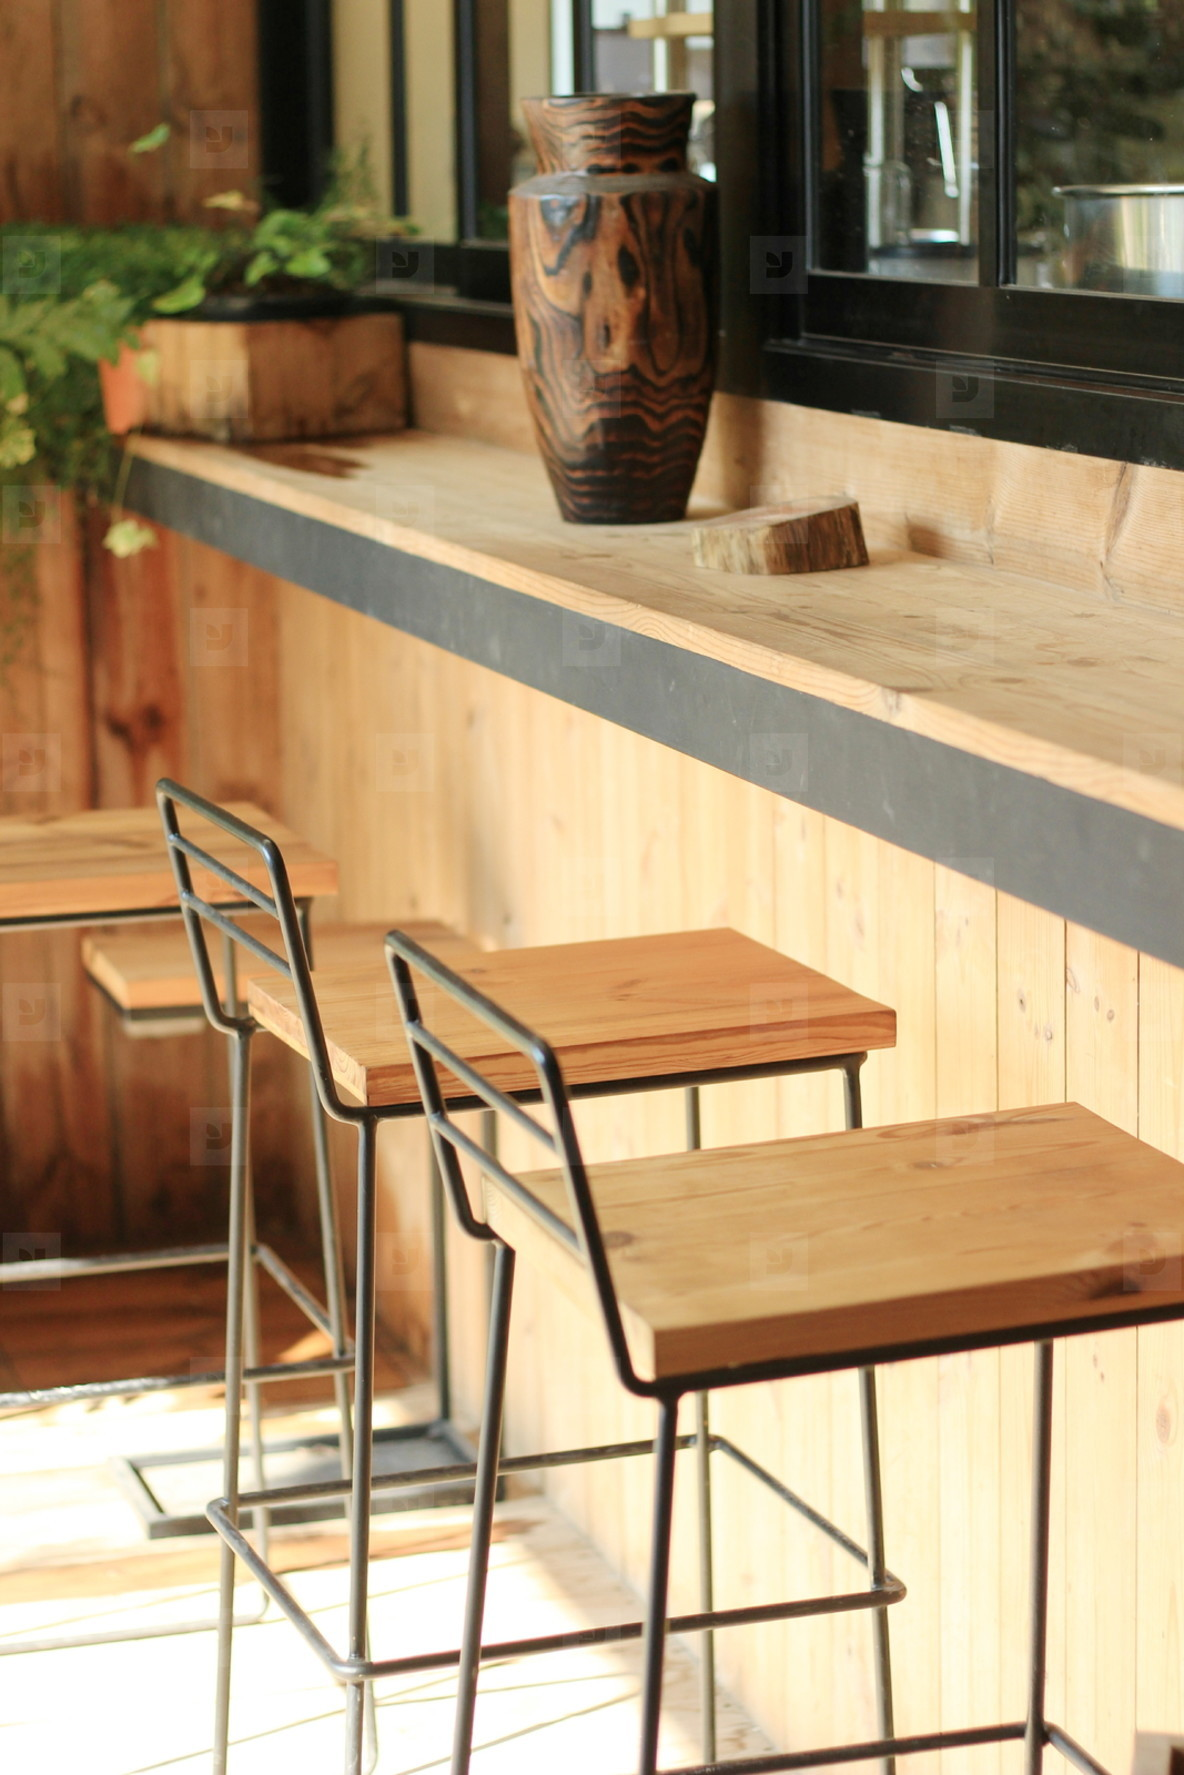 Hipster cafe interior  04